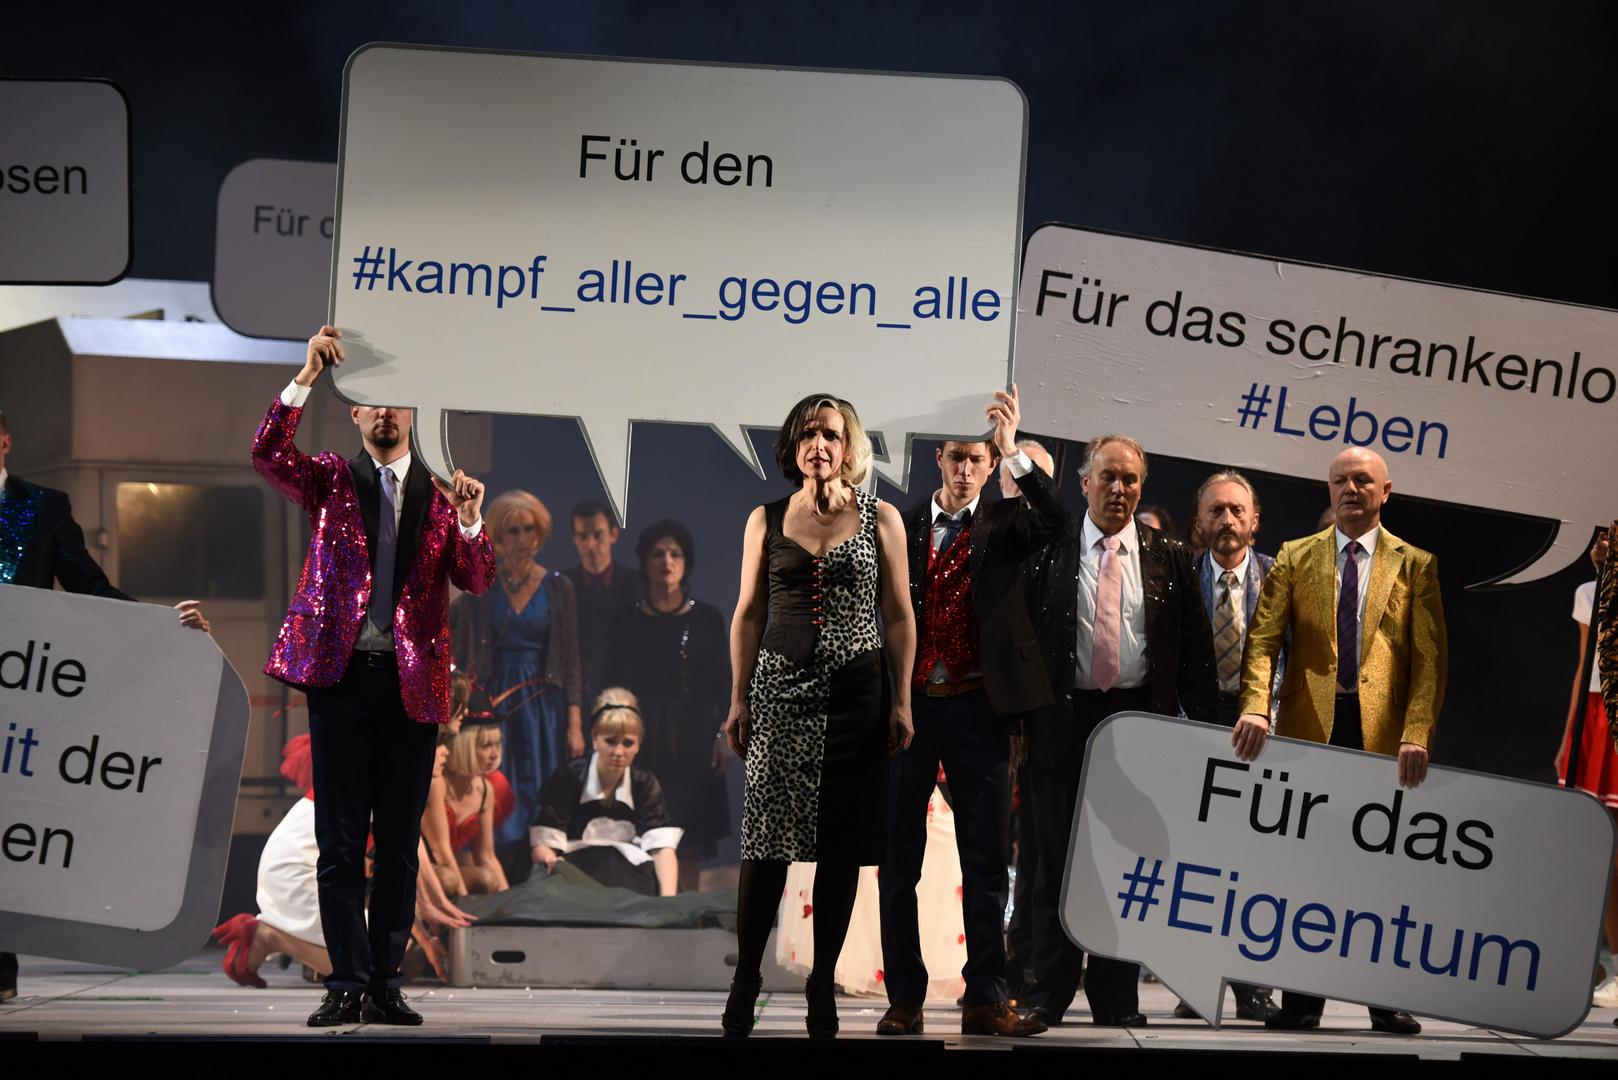 Mahagonny-Opera-by-Kurt-Weill-Stage-director-Jacopo-Spirei-Salzburg-25